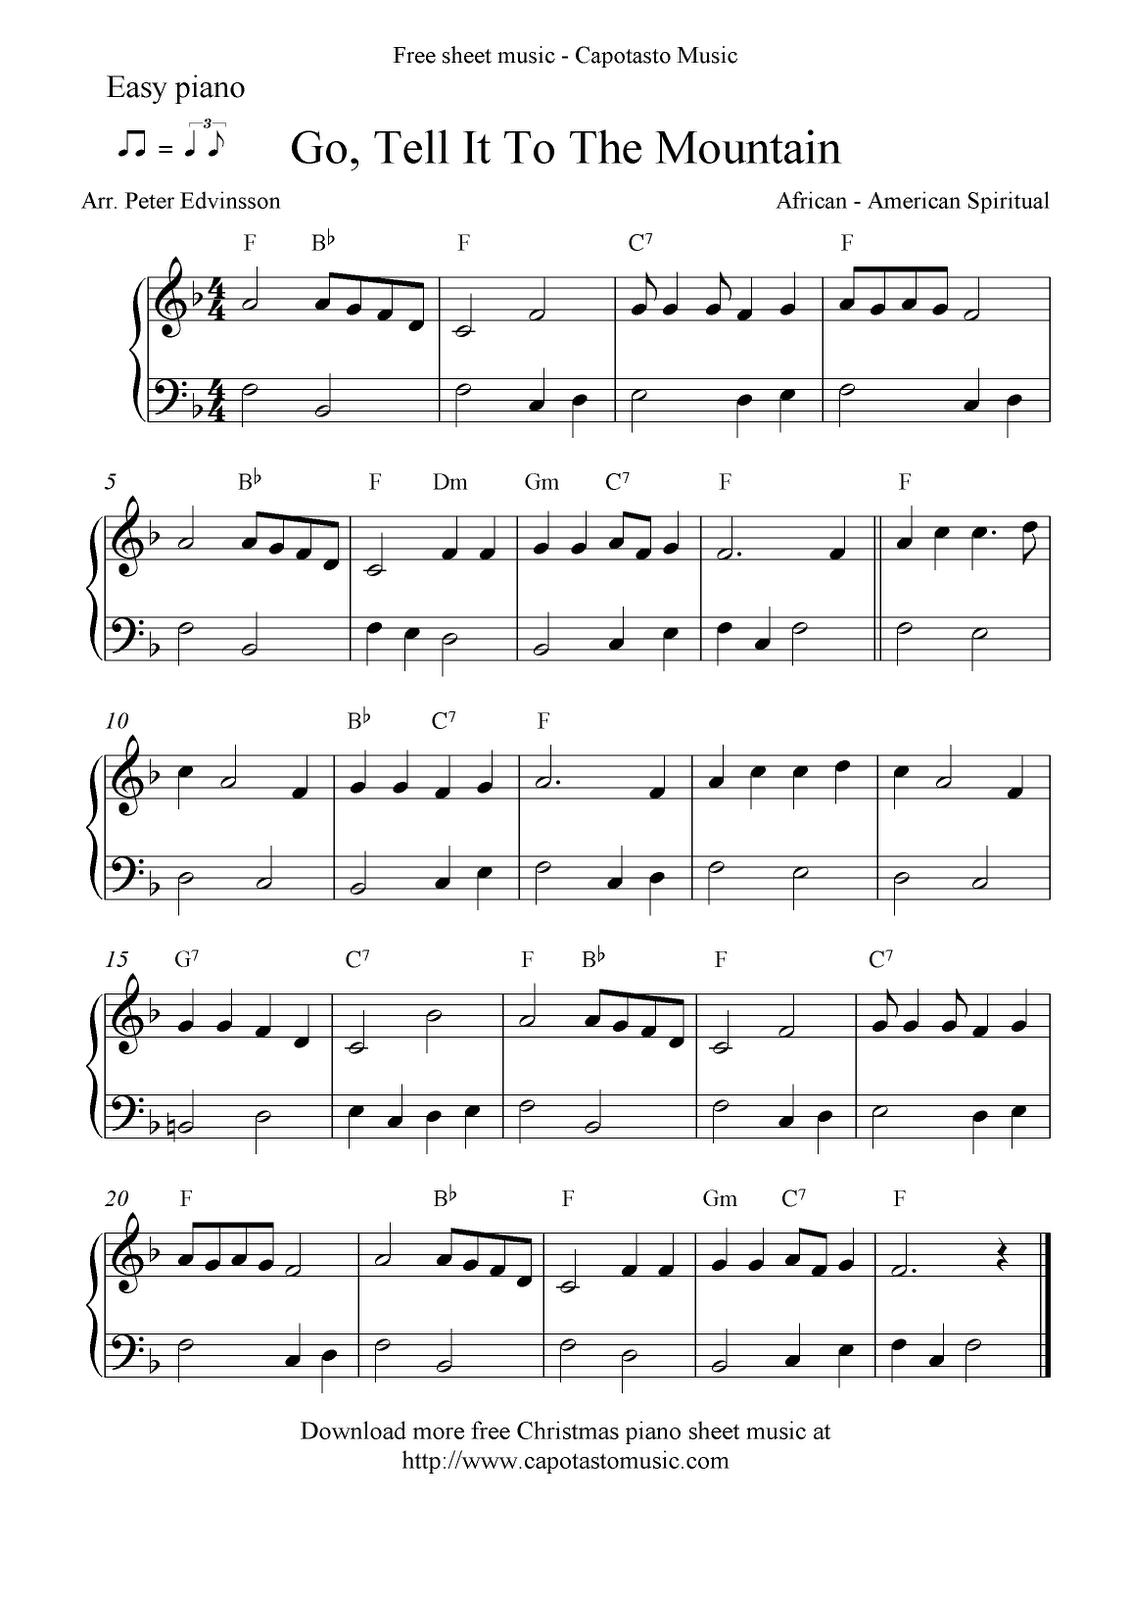 Free Printable Piano Sheet Music | Free Sheet Music Scores: Easy - Free Printable Christmas Music Sheets Piano